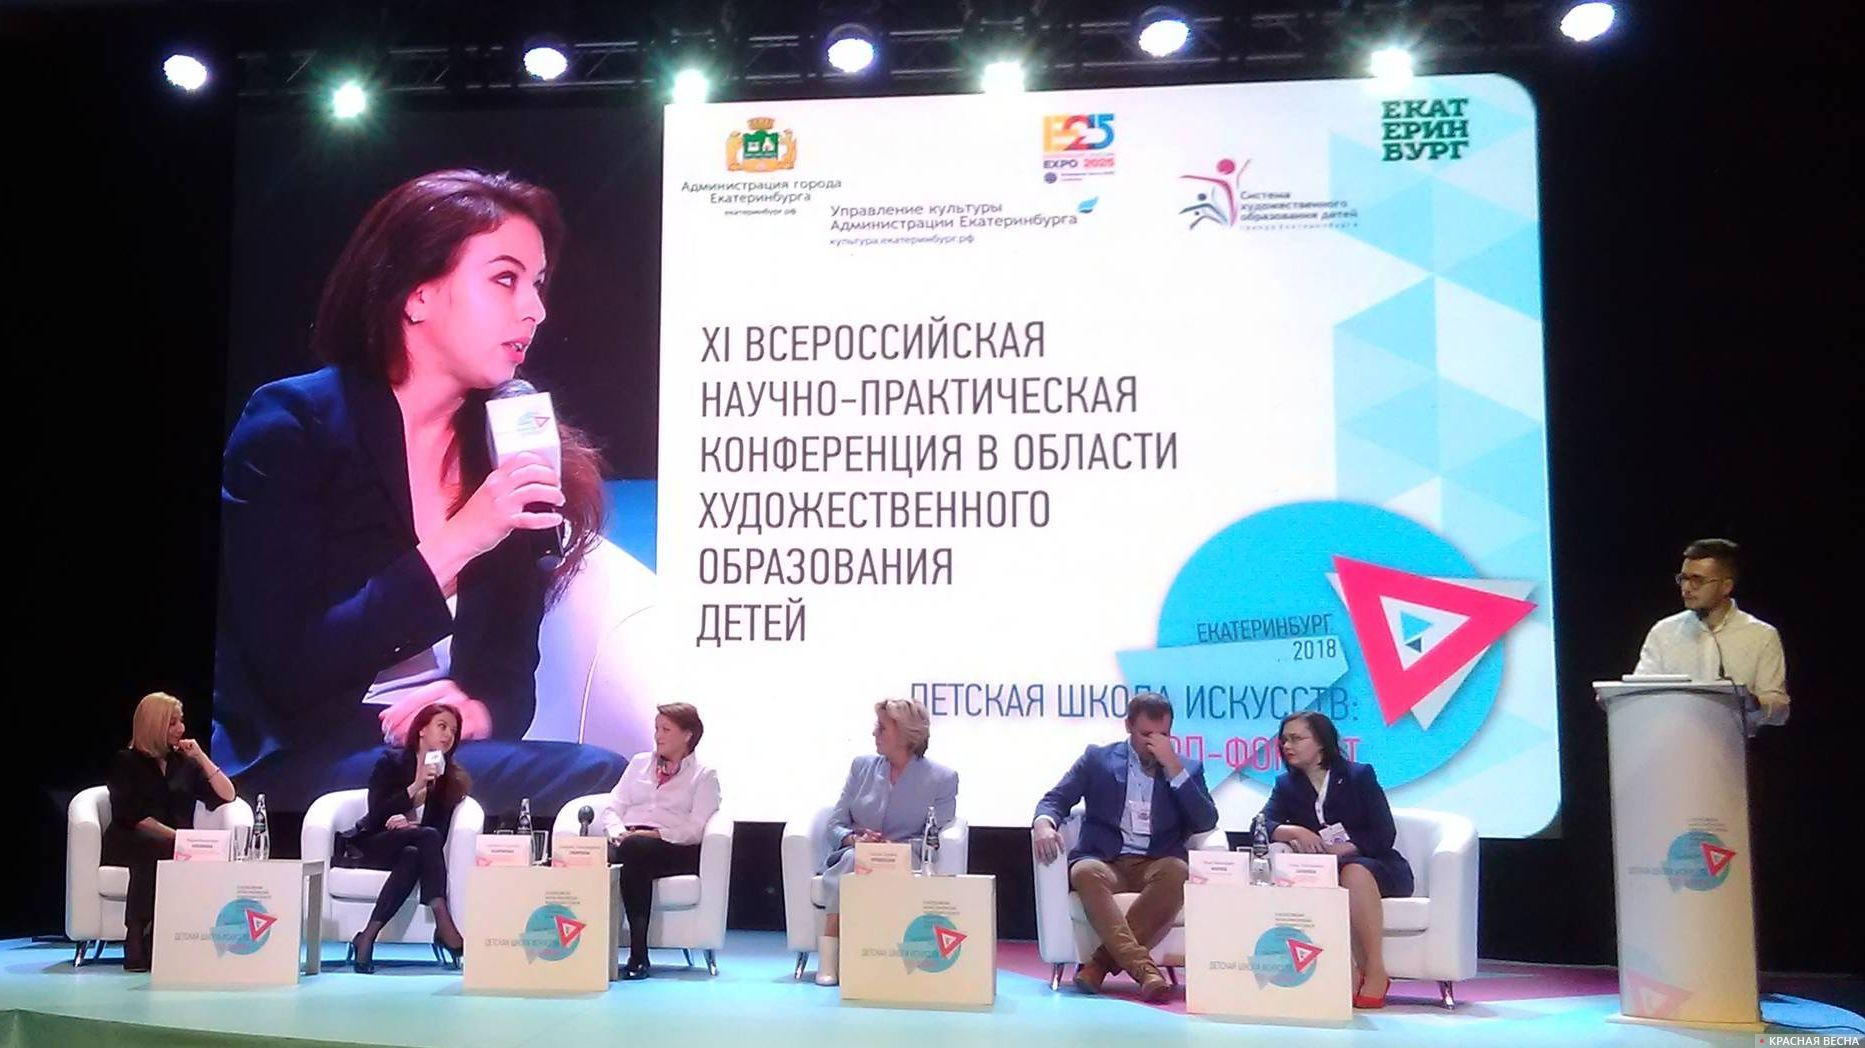 Мария Кабланова (на экране). В зале - вторая слева